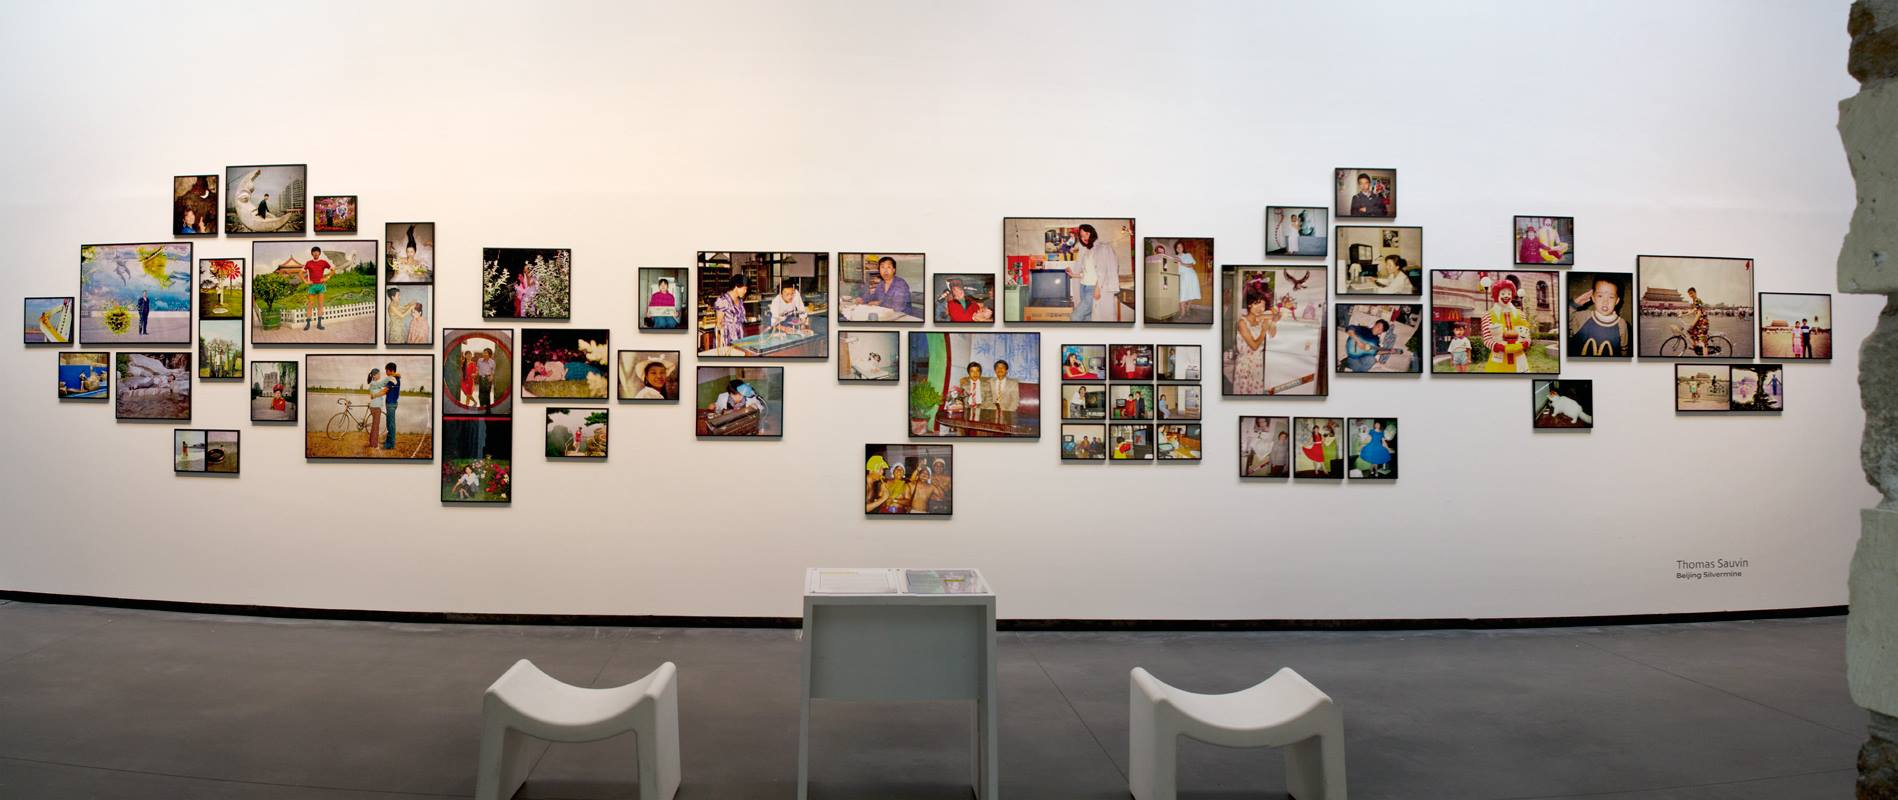 Thomas Sauvin, Beijing Silvermine – L'Atelier à Nantes